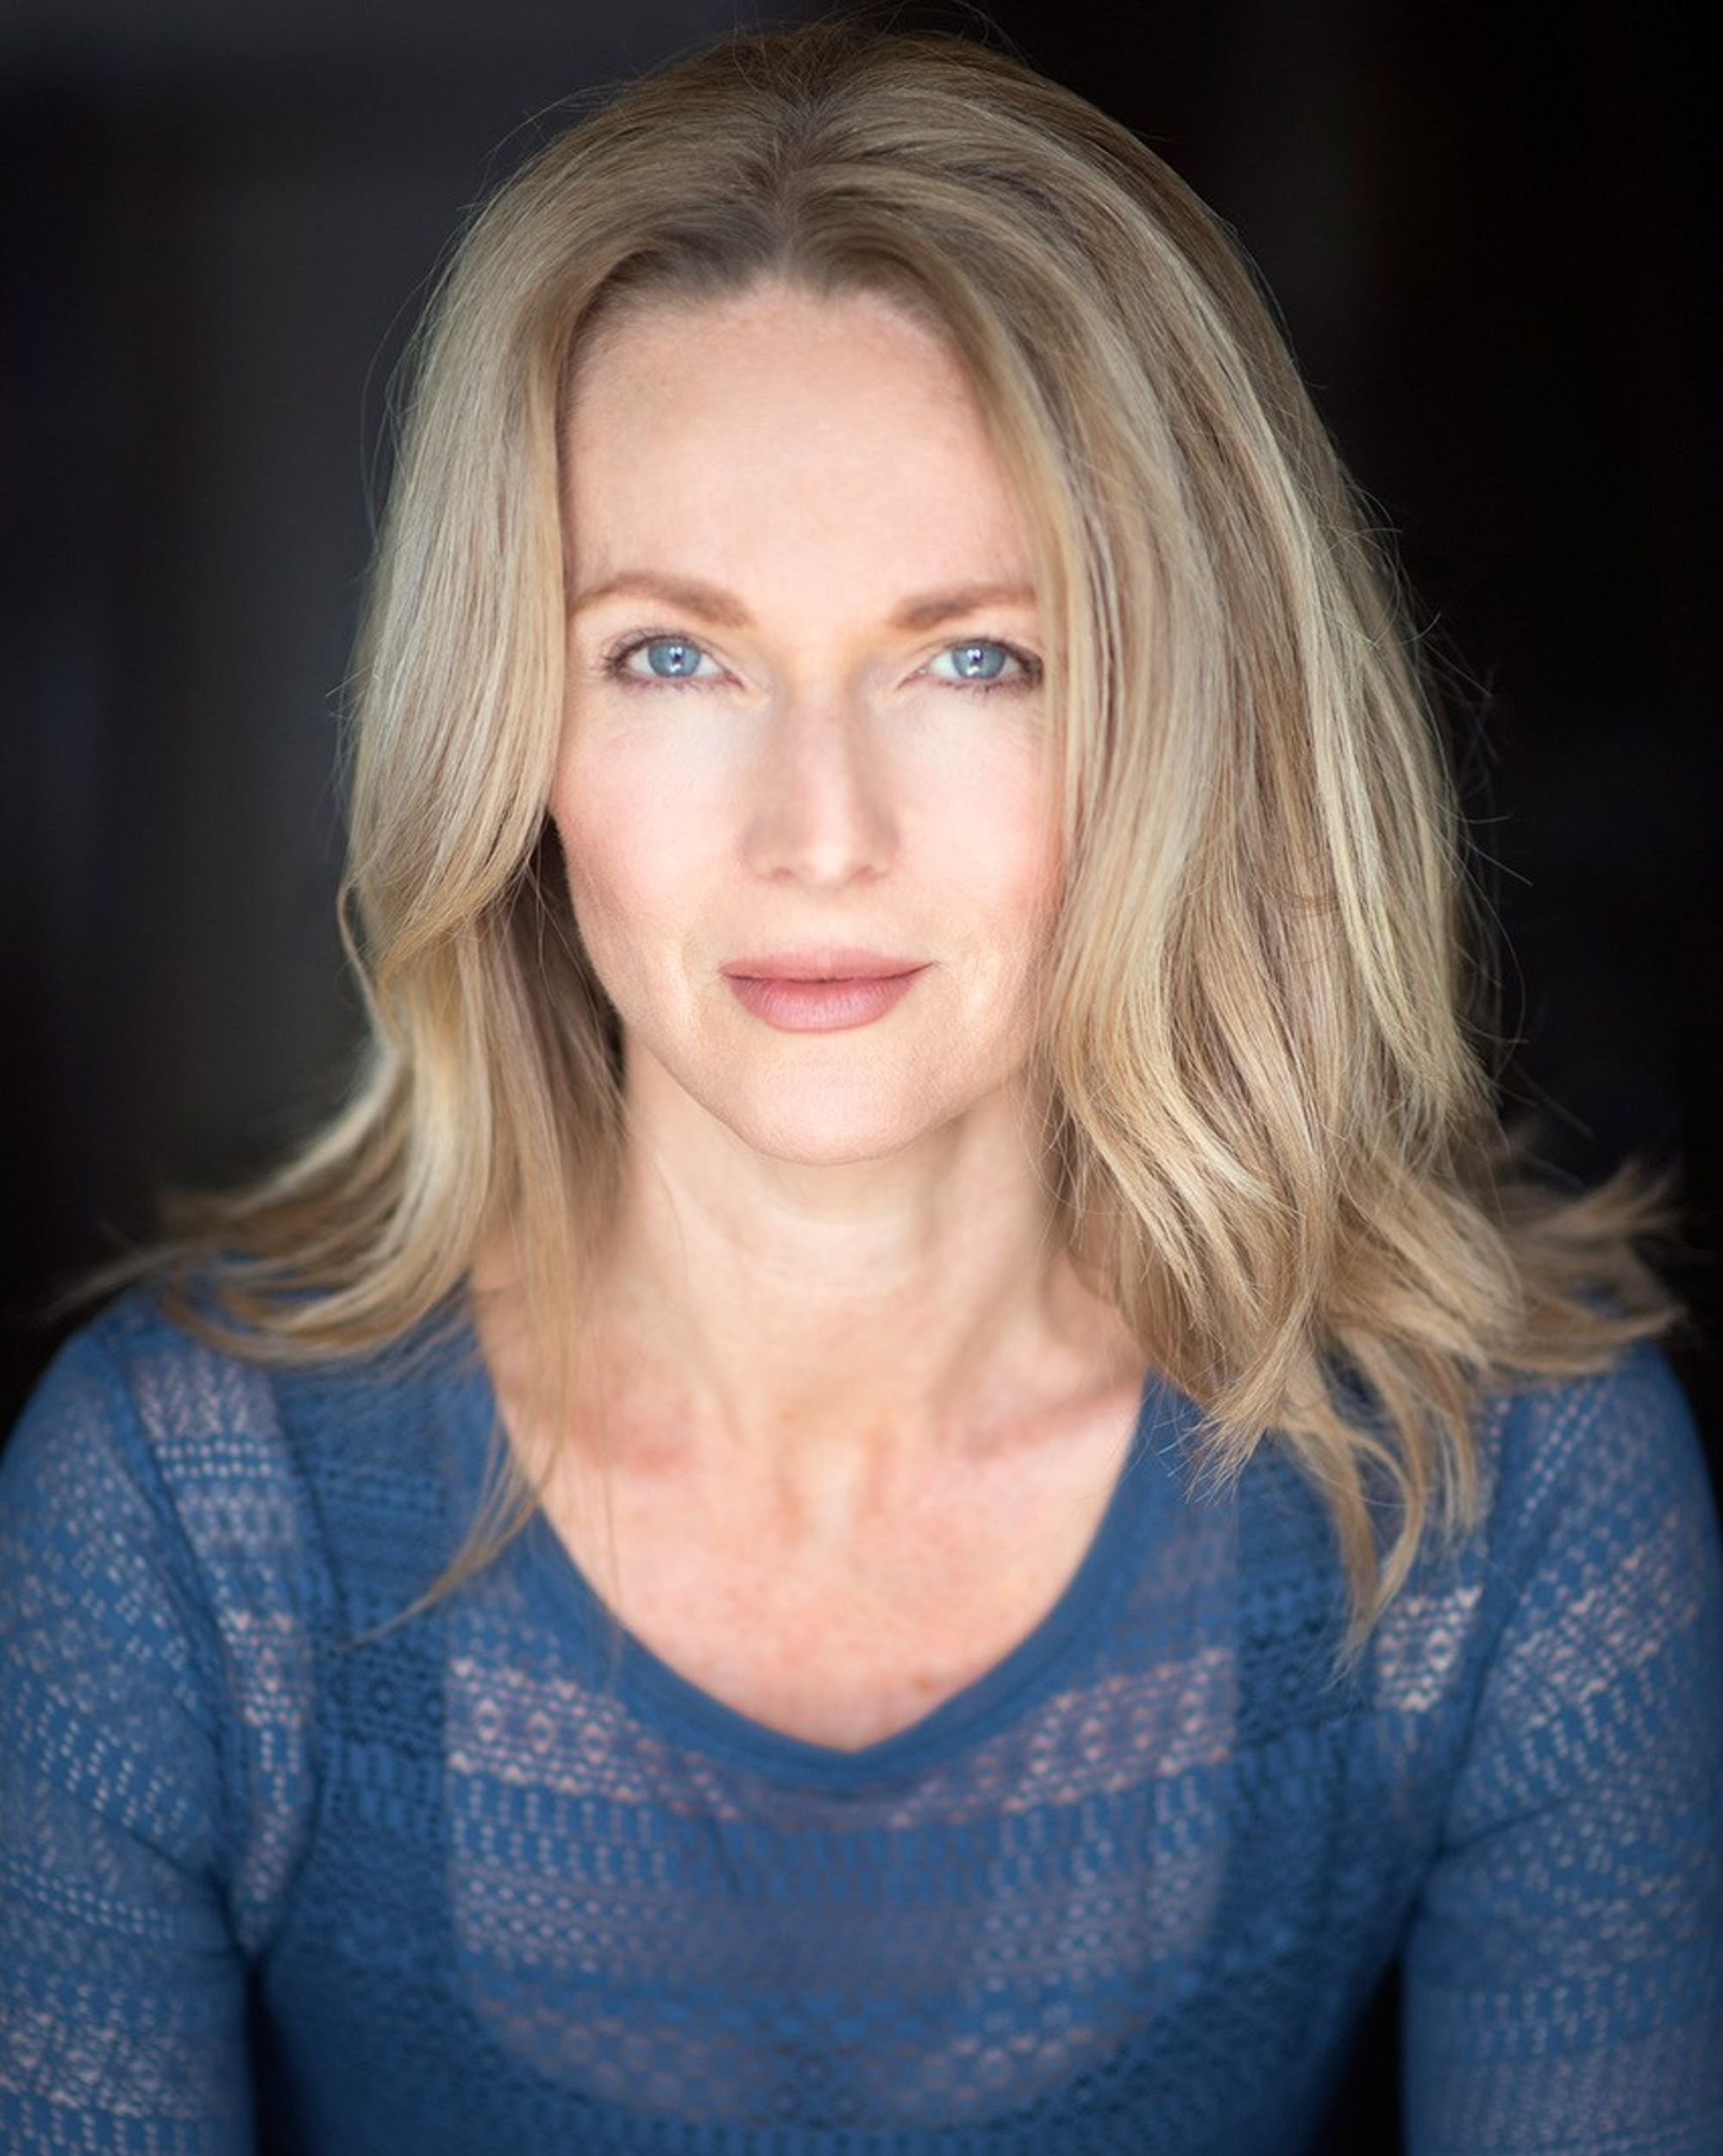 Anne McCaffery